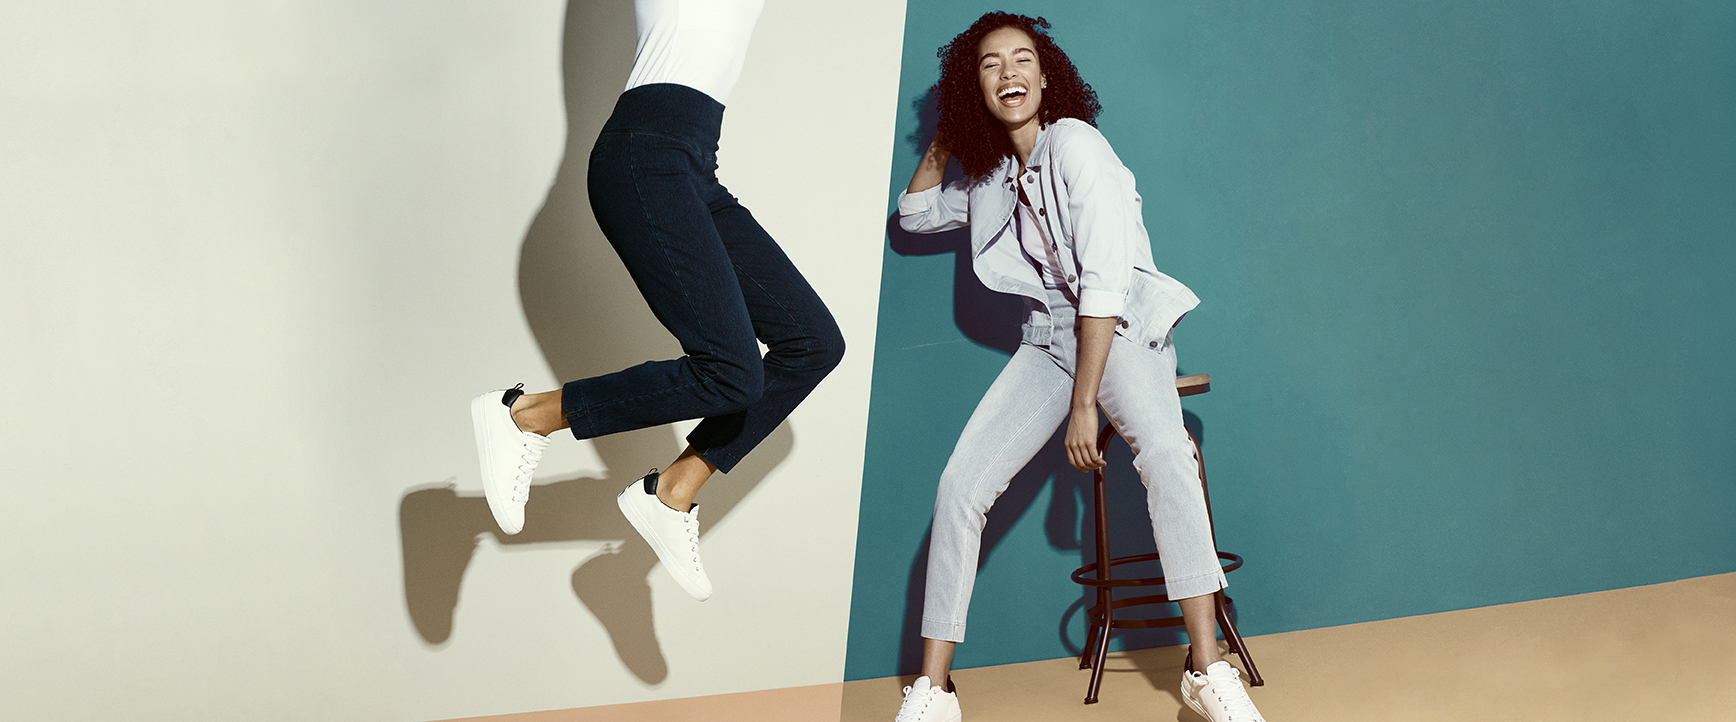 Wink Models Australia | Modelling and Talent Agency